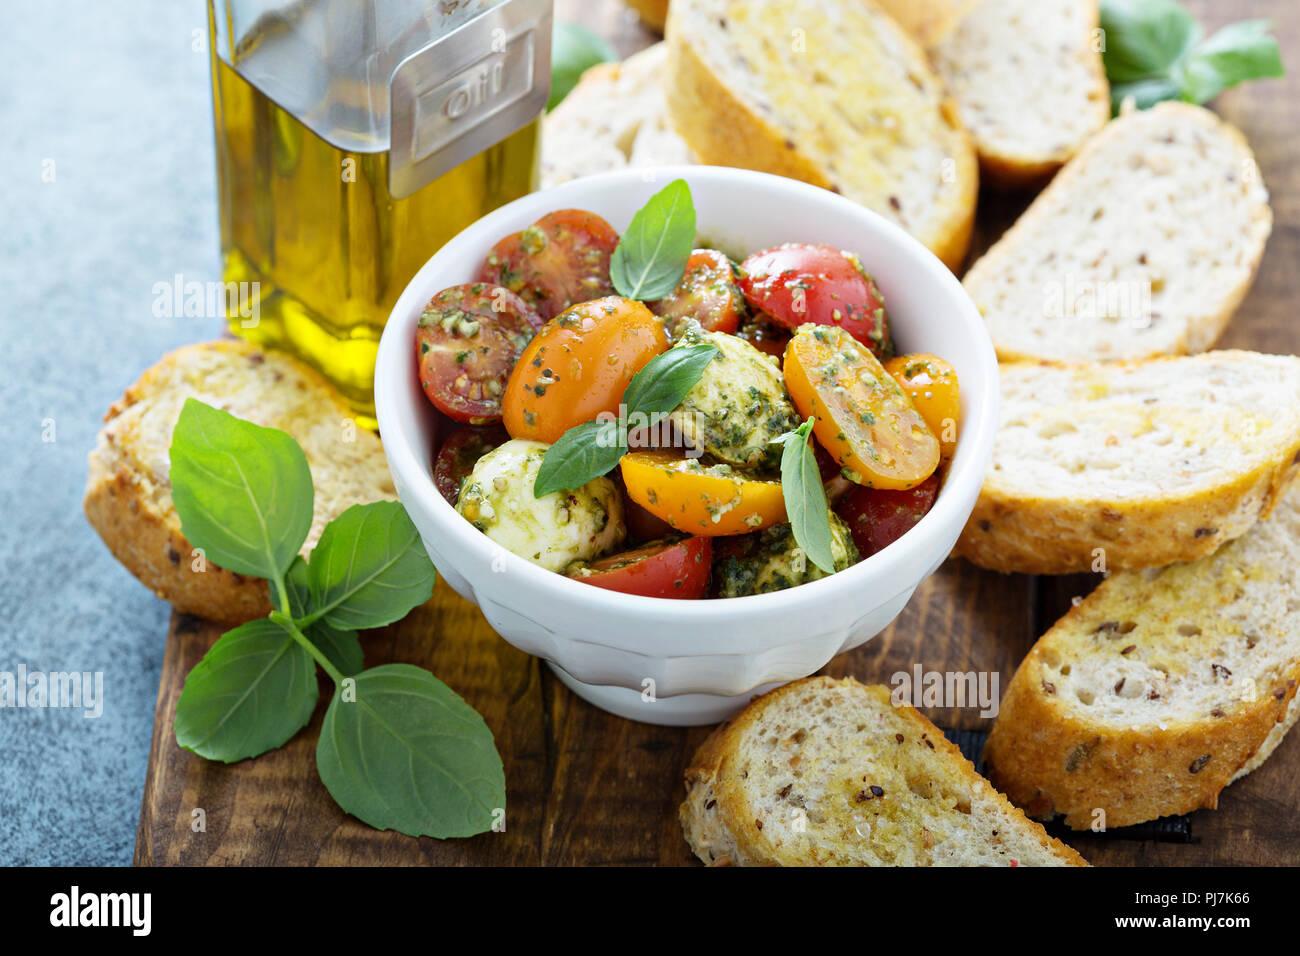 Caprese bruschetta with cherry tomatoes, mozarella and basil pesto - Stock Image